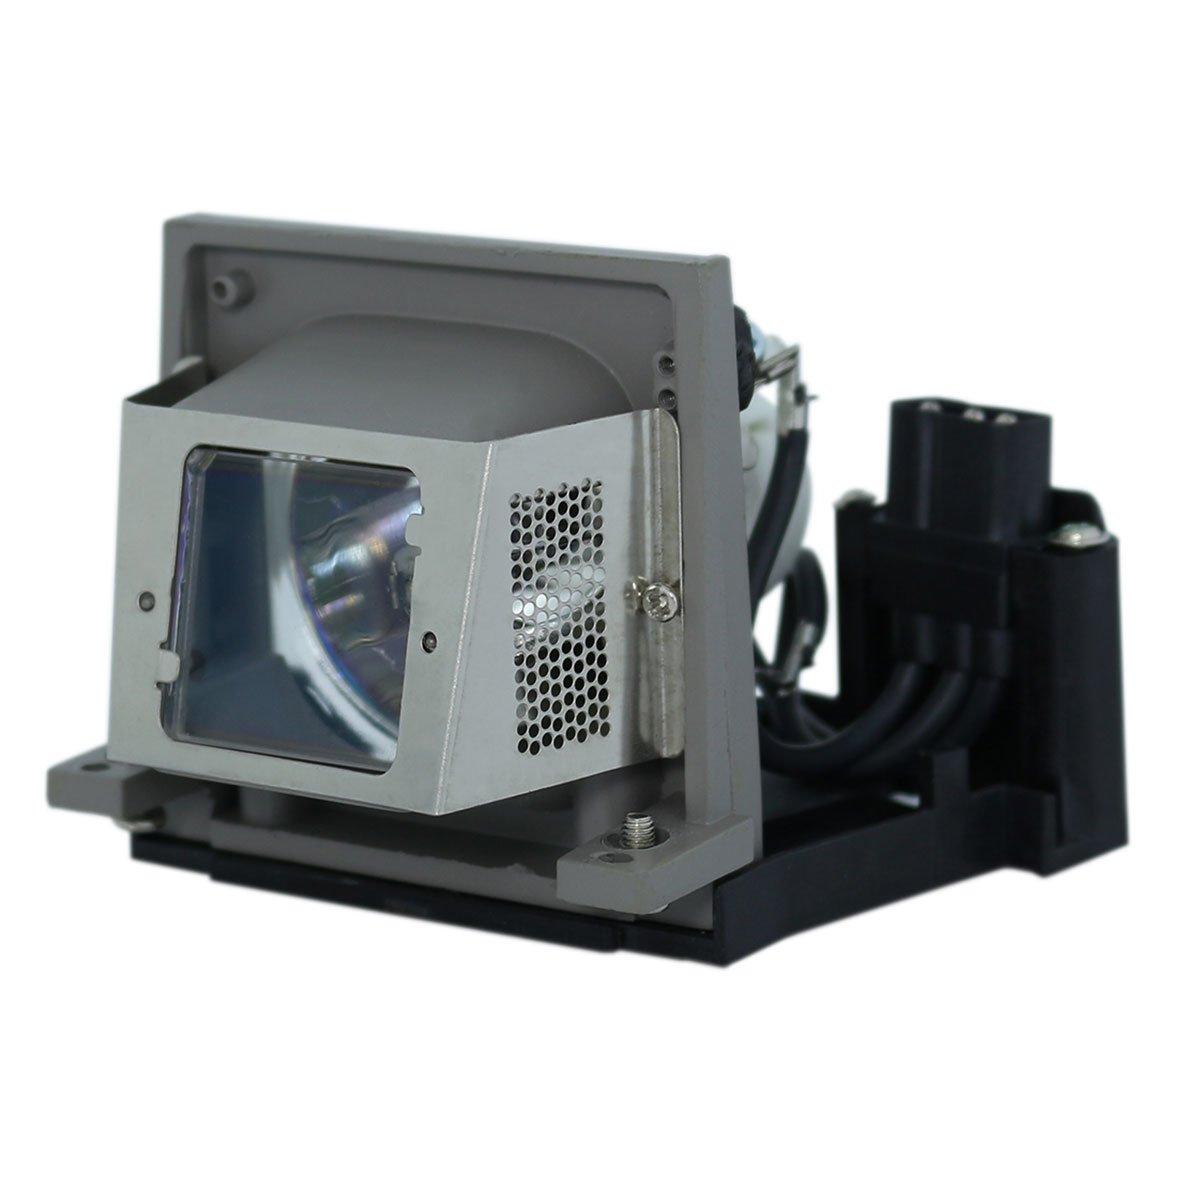 Lutema OEMプロジェクター交換用ランプ ハウジング/電球付き 三菱 XD206用 Platinum (Brighter/Durable) B07KTLCC2K Lamp with Housing Platinum (Brighter/Durable)